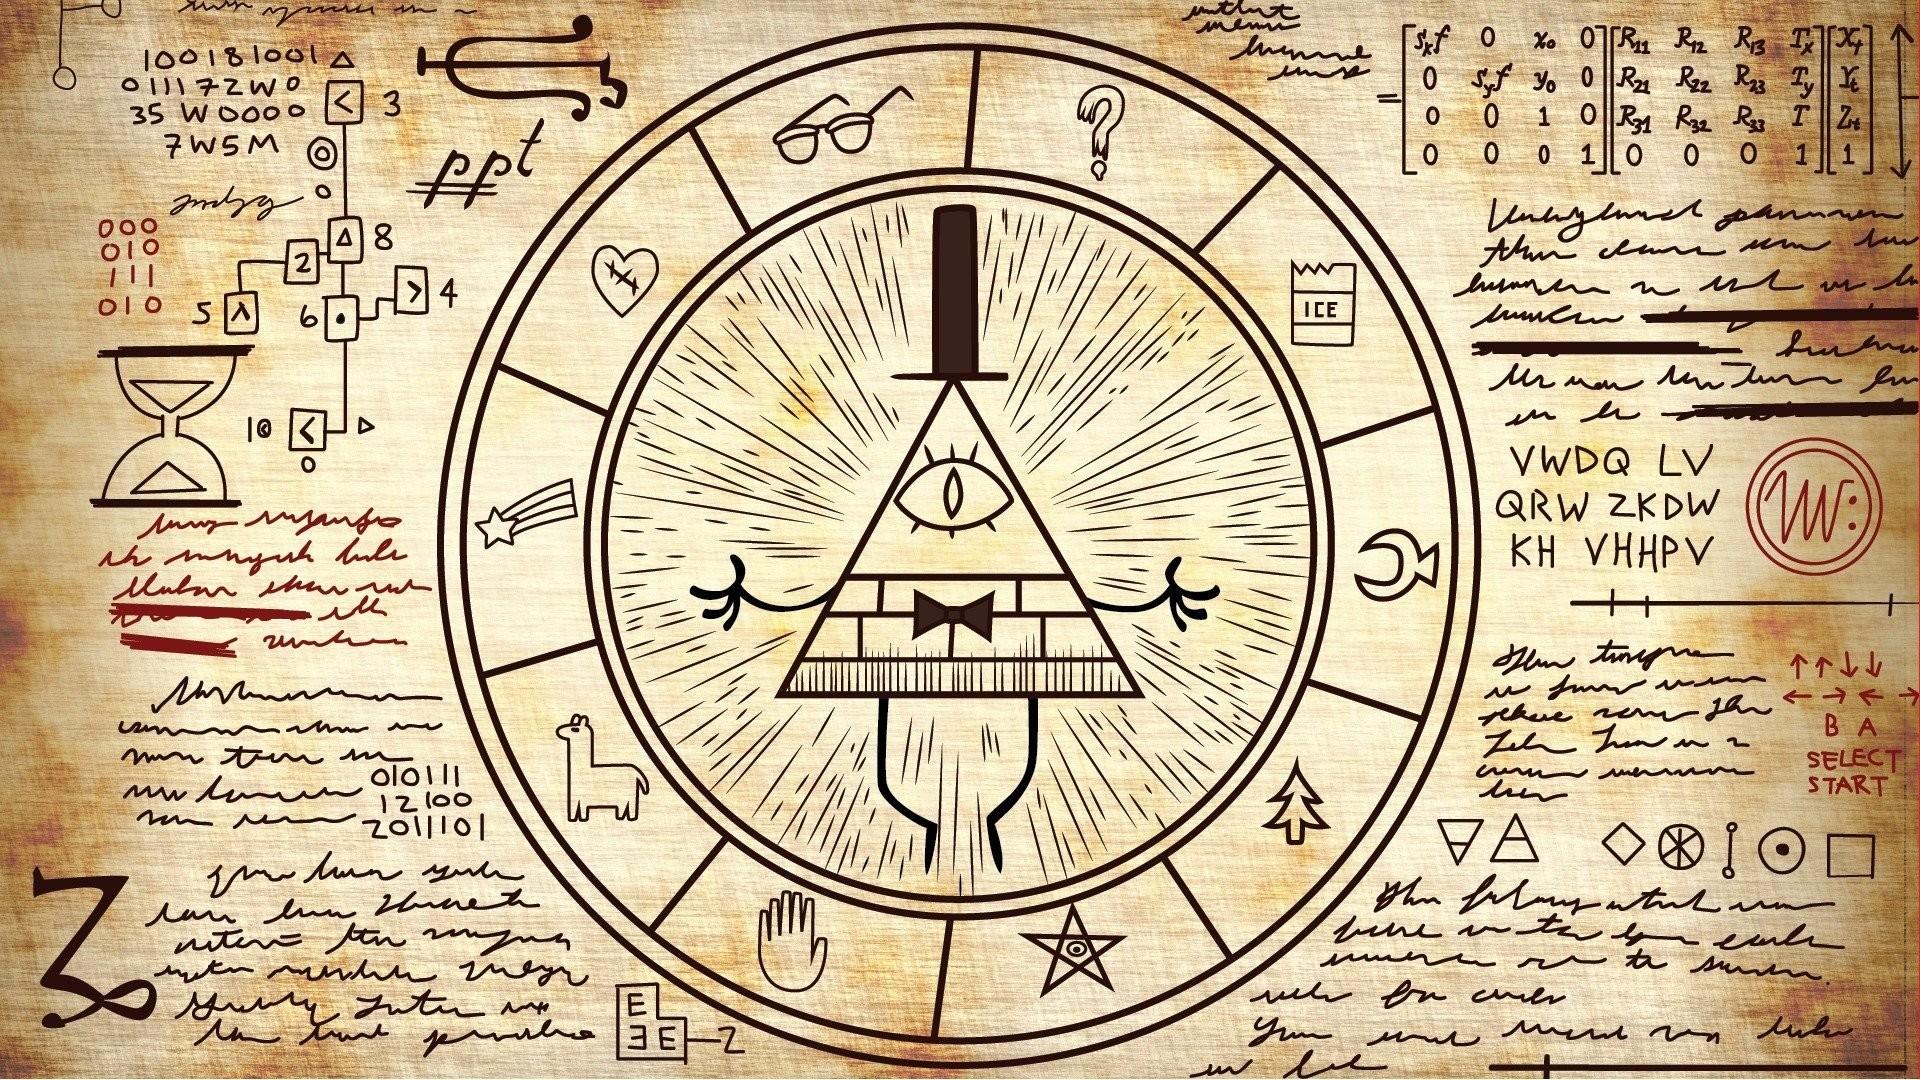 Gravity Falls Bill Cipher Wallpaper (80+ images)